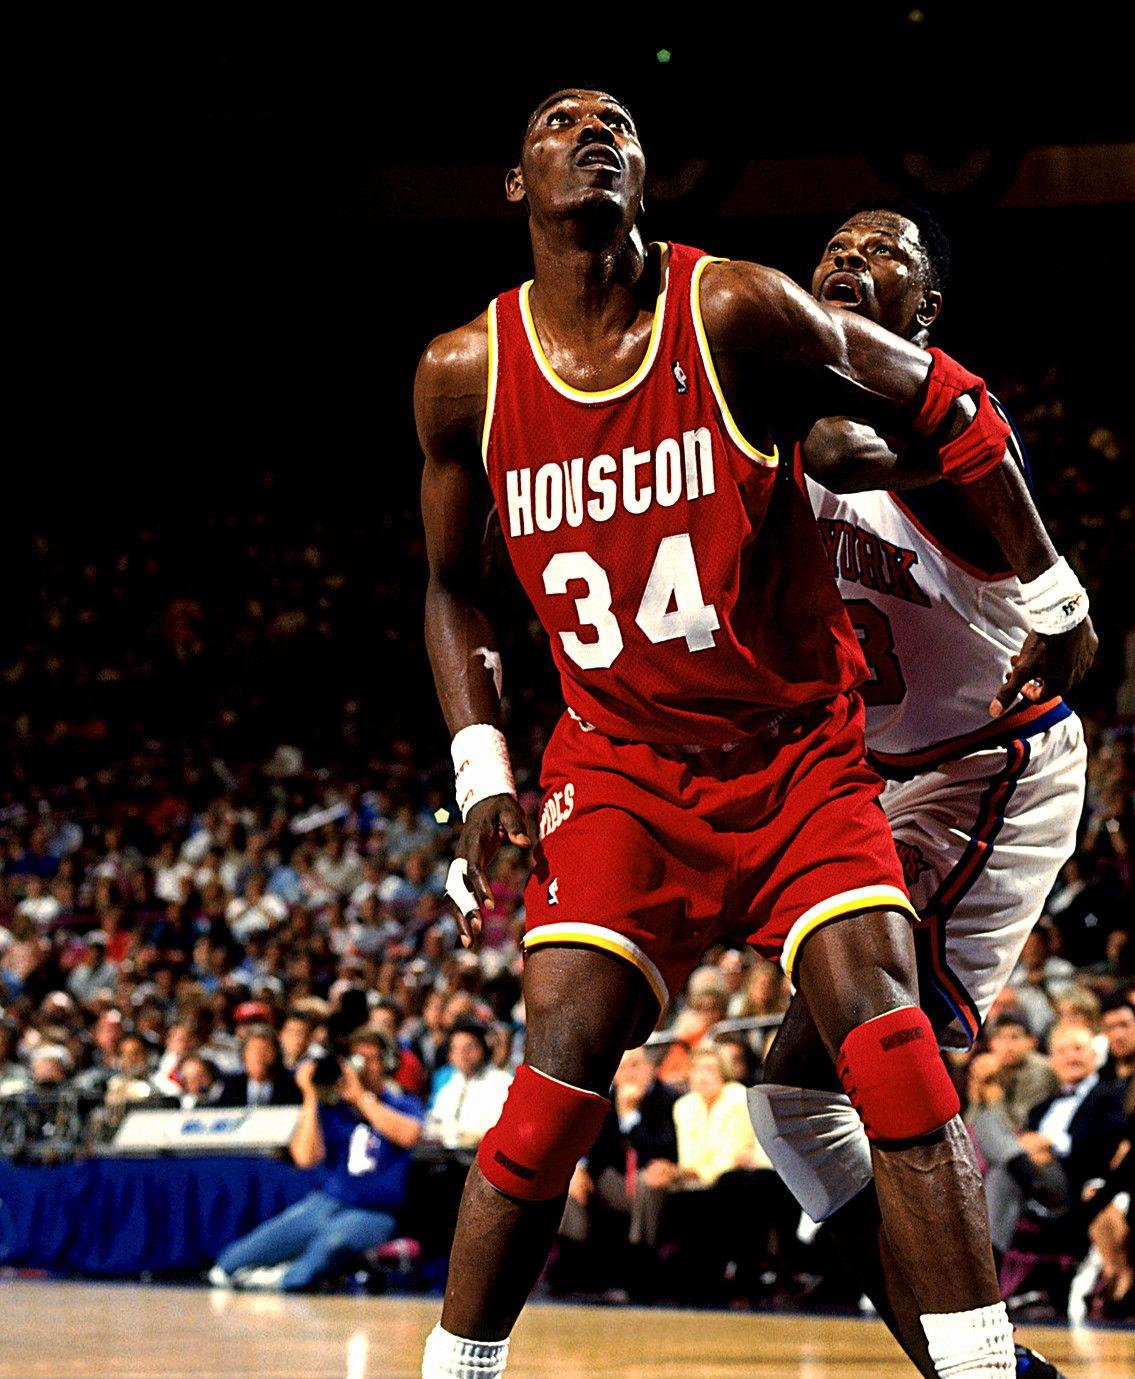 Olajuwon And Ewing Box Out, '94 Finals. Nba basketball